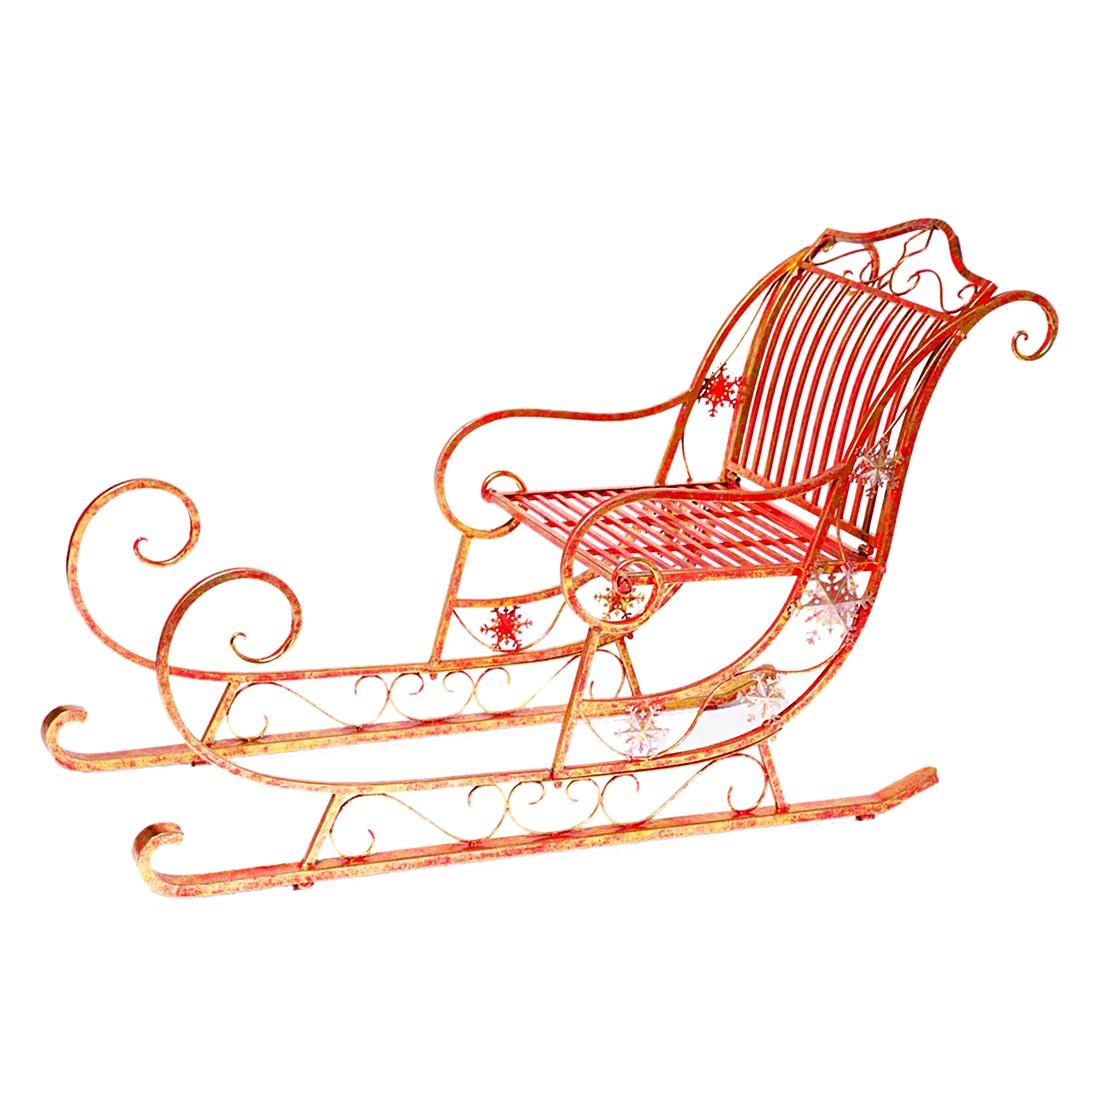 figuren aus metall g nstig kaufen. Black Bedroom Furniture Sets. Home Design Ideas